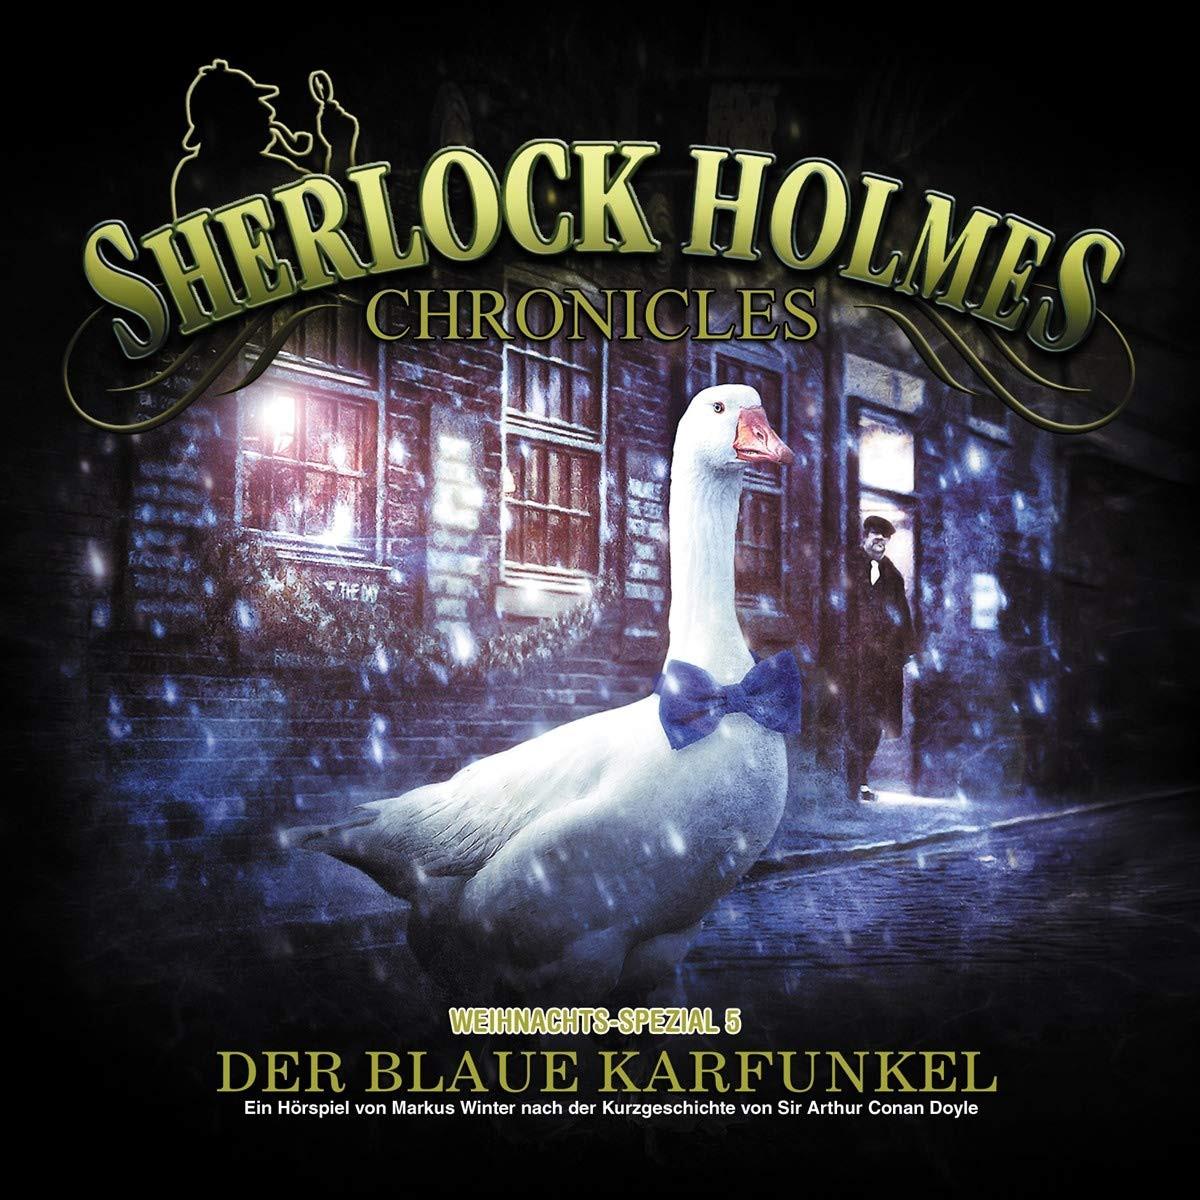 Sherlock Holmes Chronicles - X-MAS Special 5: Der blaue Karfunkel